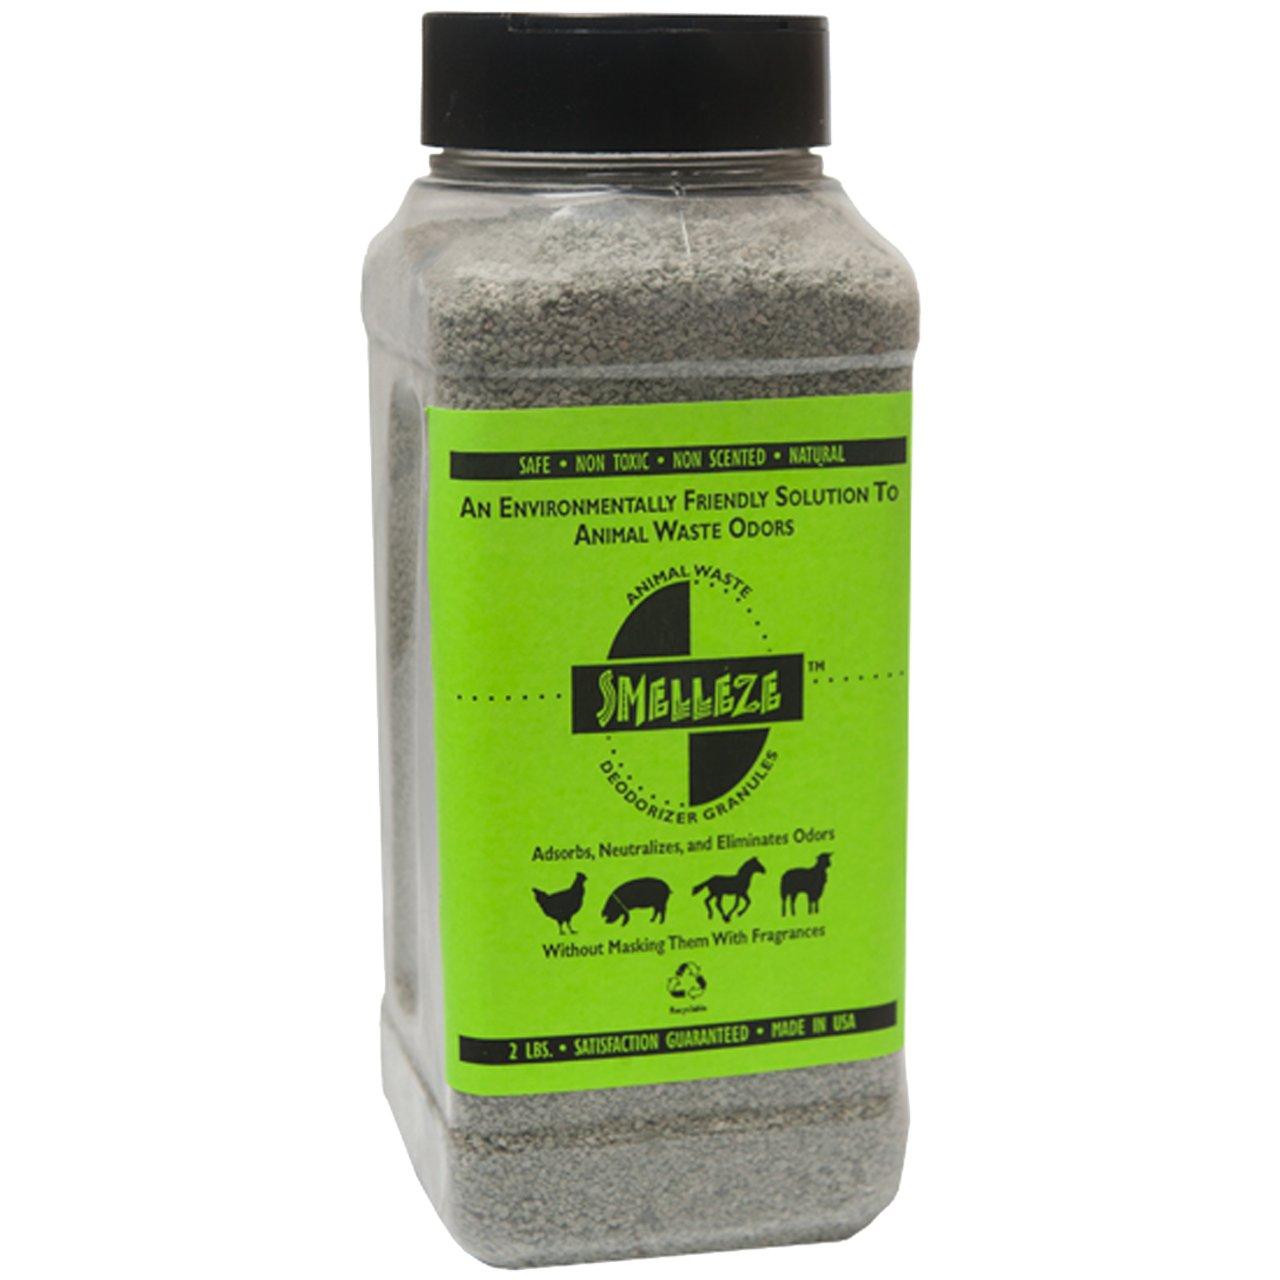 SMELLEZE Natural Animal Waste Odor Removal Deodorizer: 50 lb. Granules Rid Feces & Urine Stench by SMELLEZE